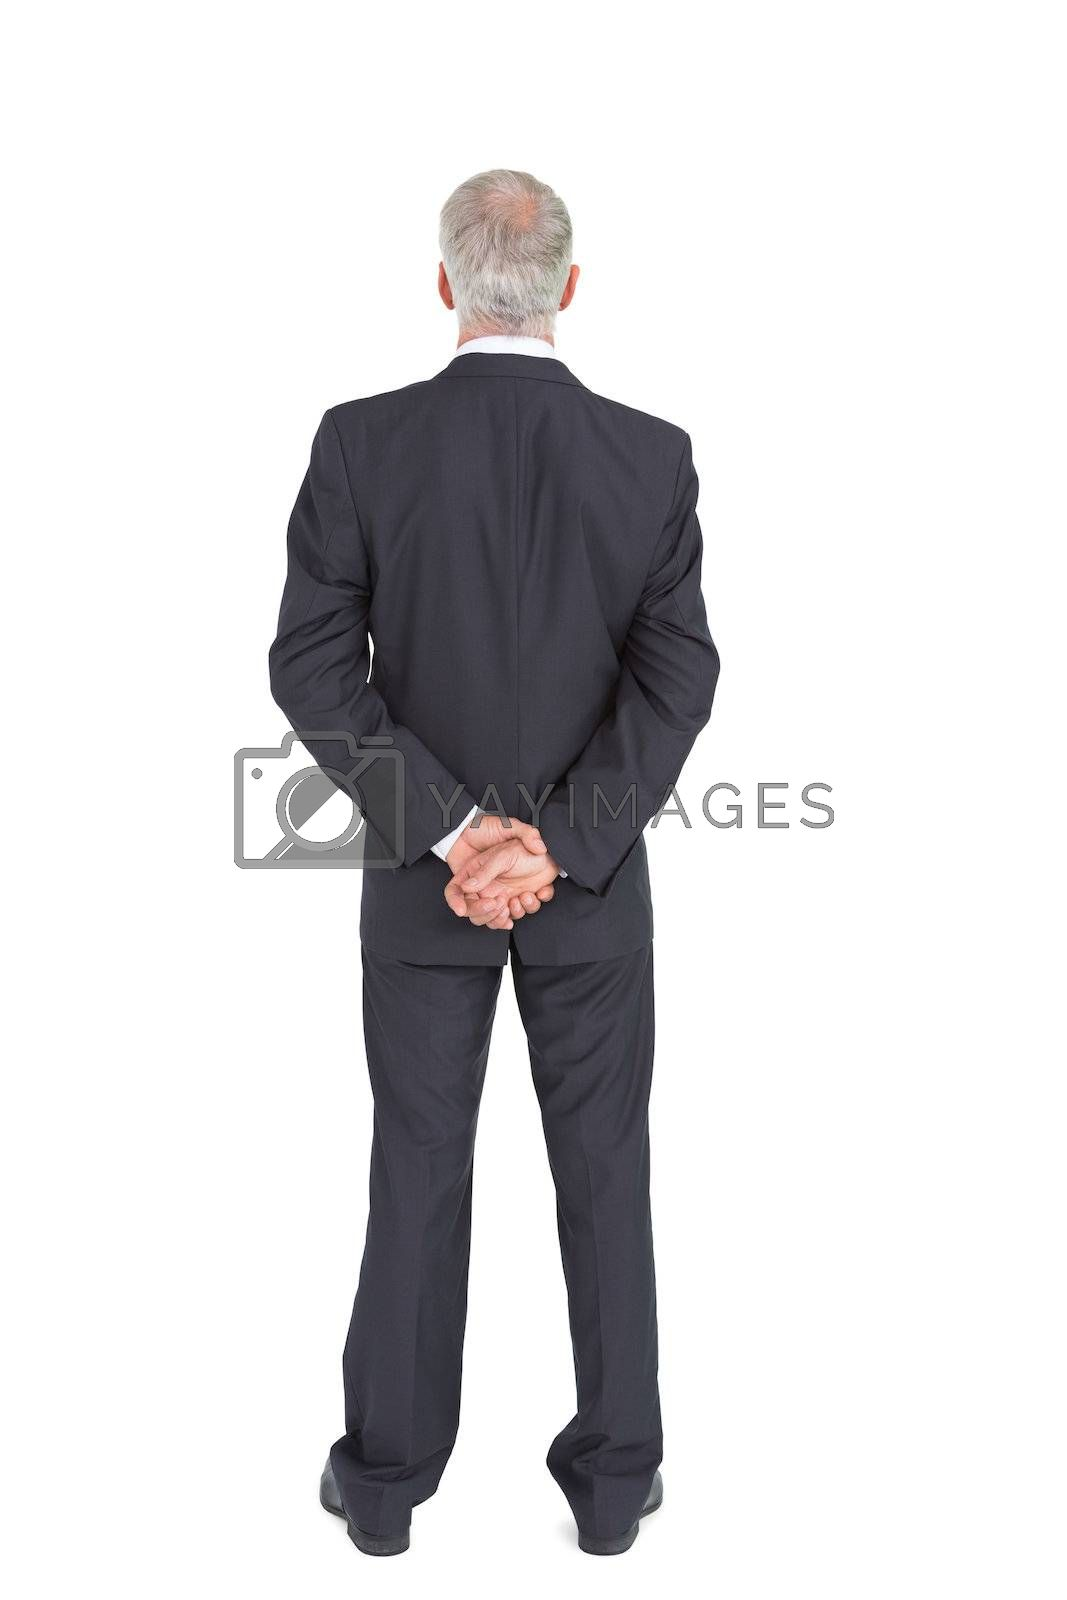 Rear view of serious businessman posing by Wavebreakmedia